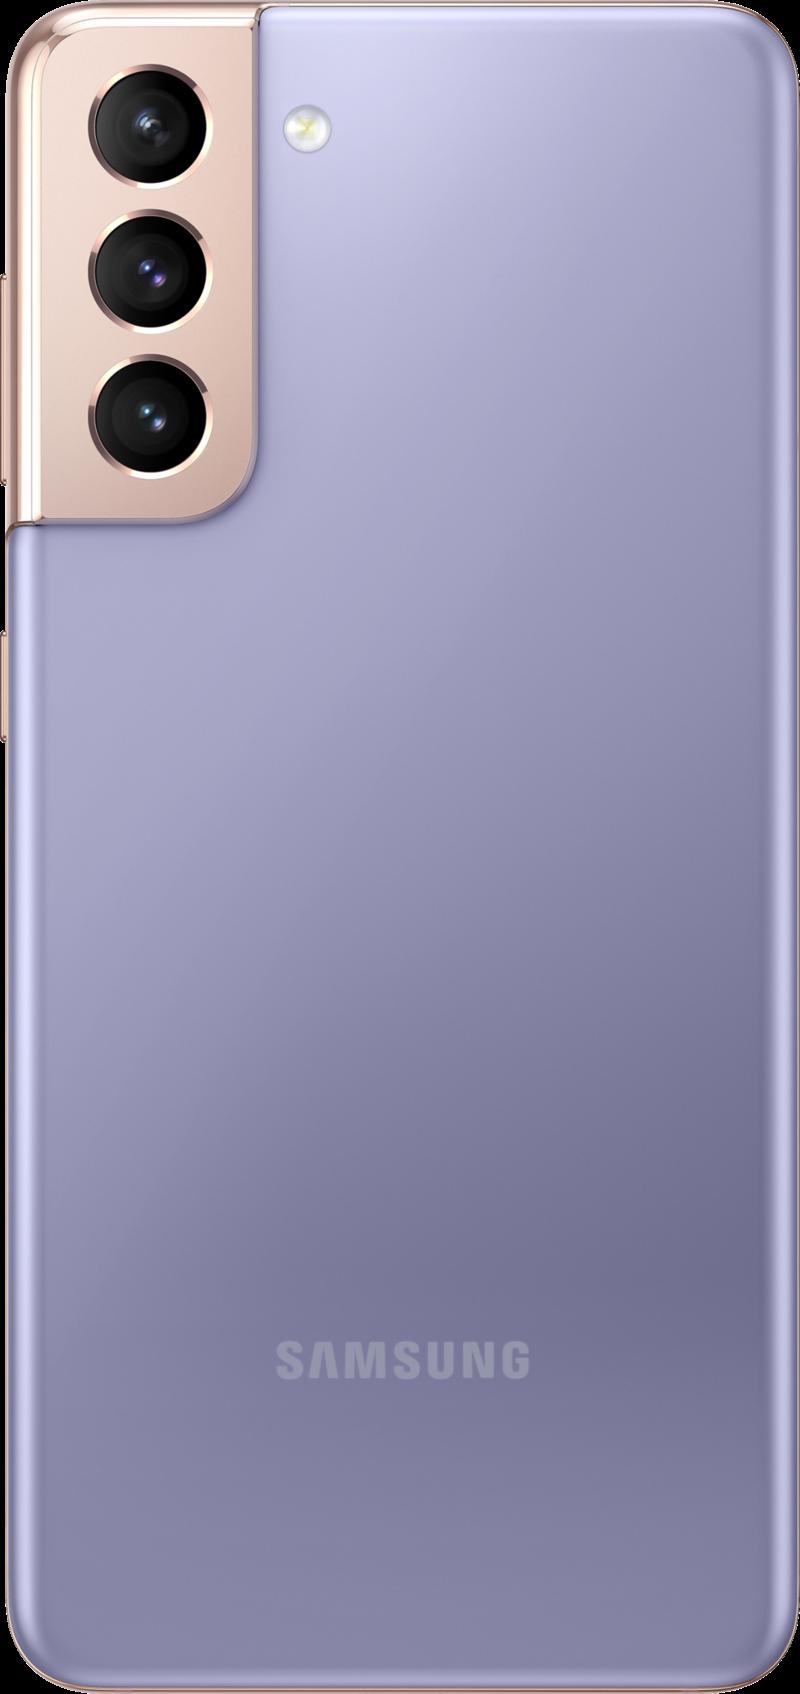 samsung-galaxy-s21-render-phantom-violet-back-official.png